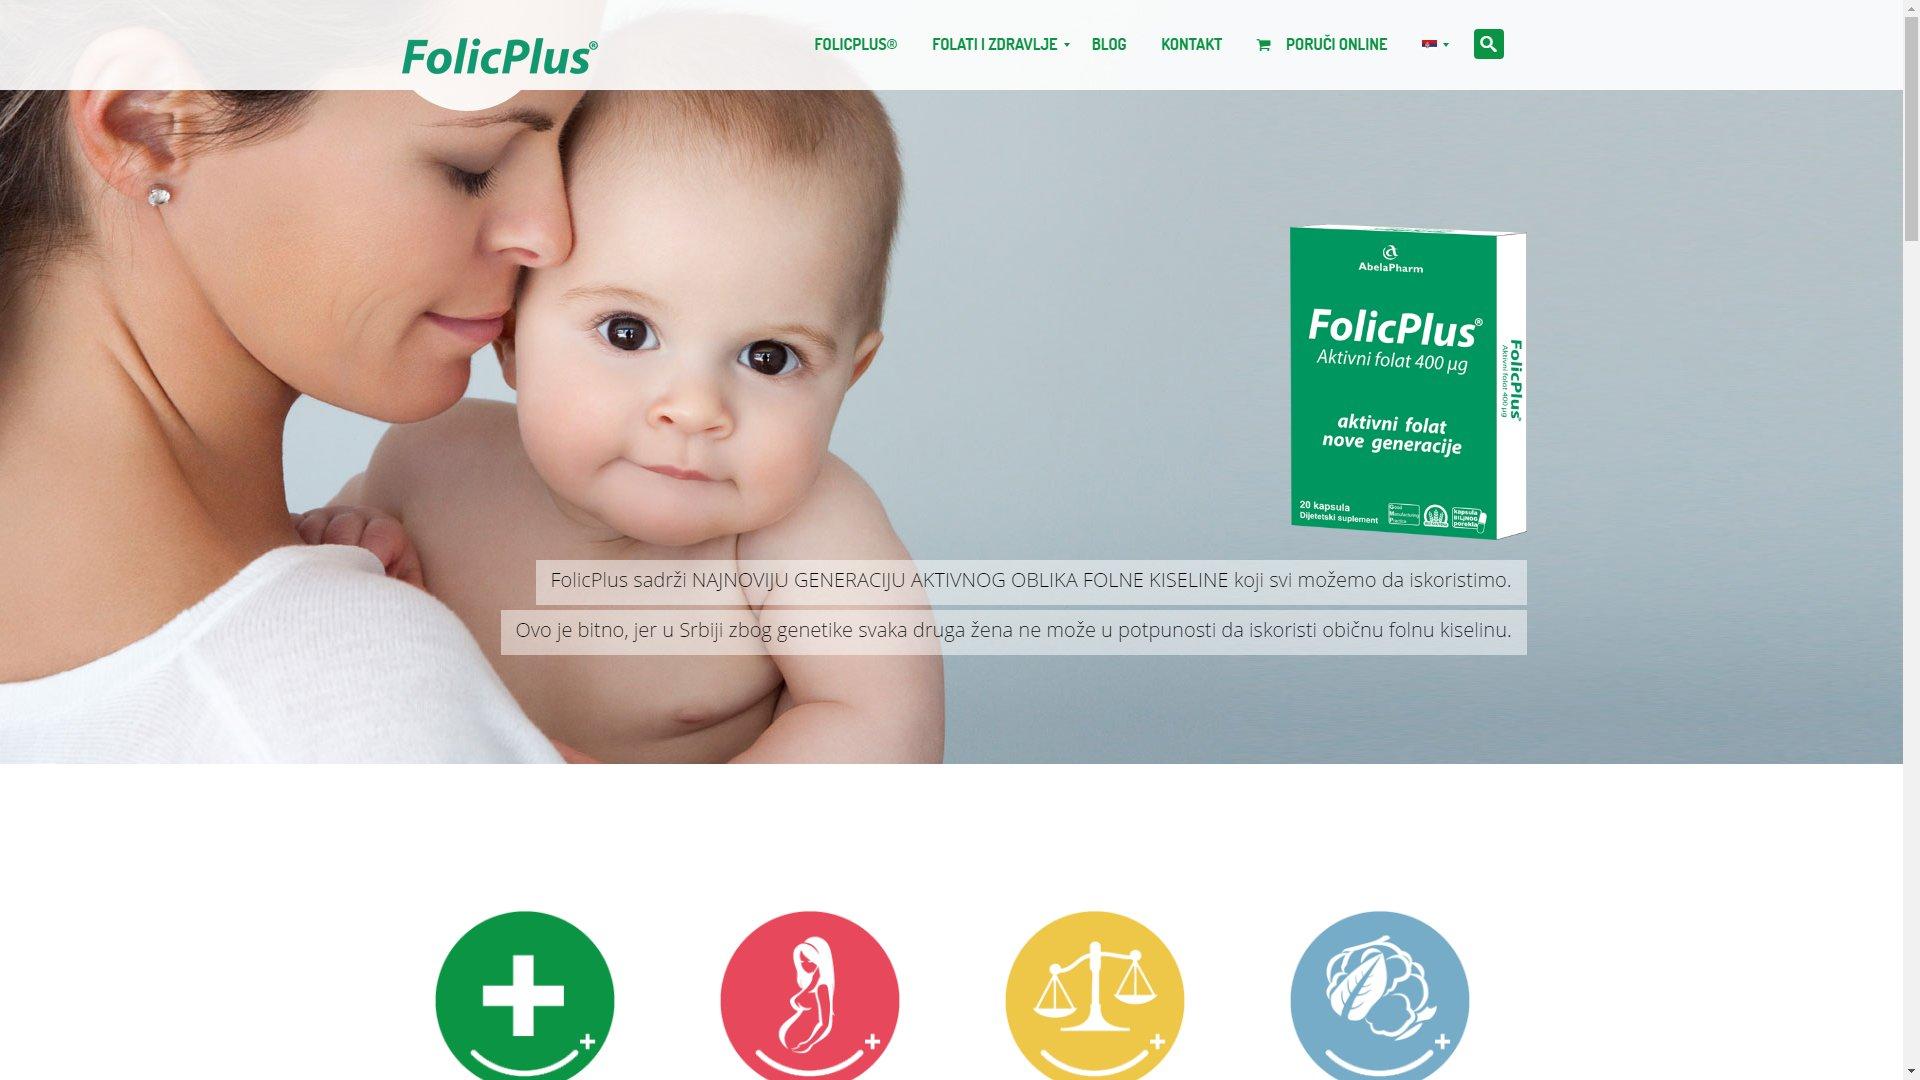 Folic Plus website - ss1